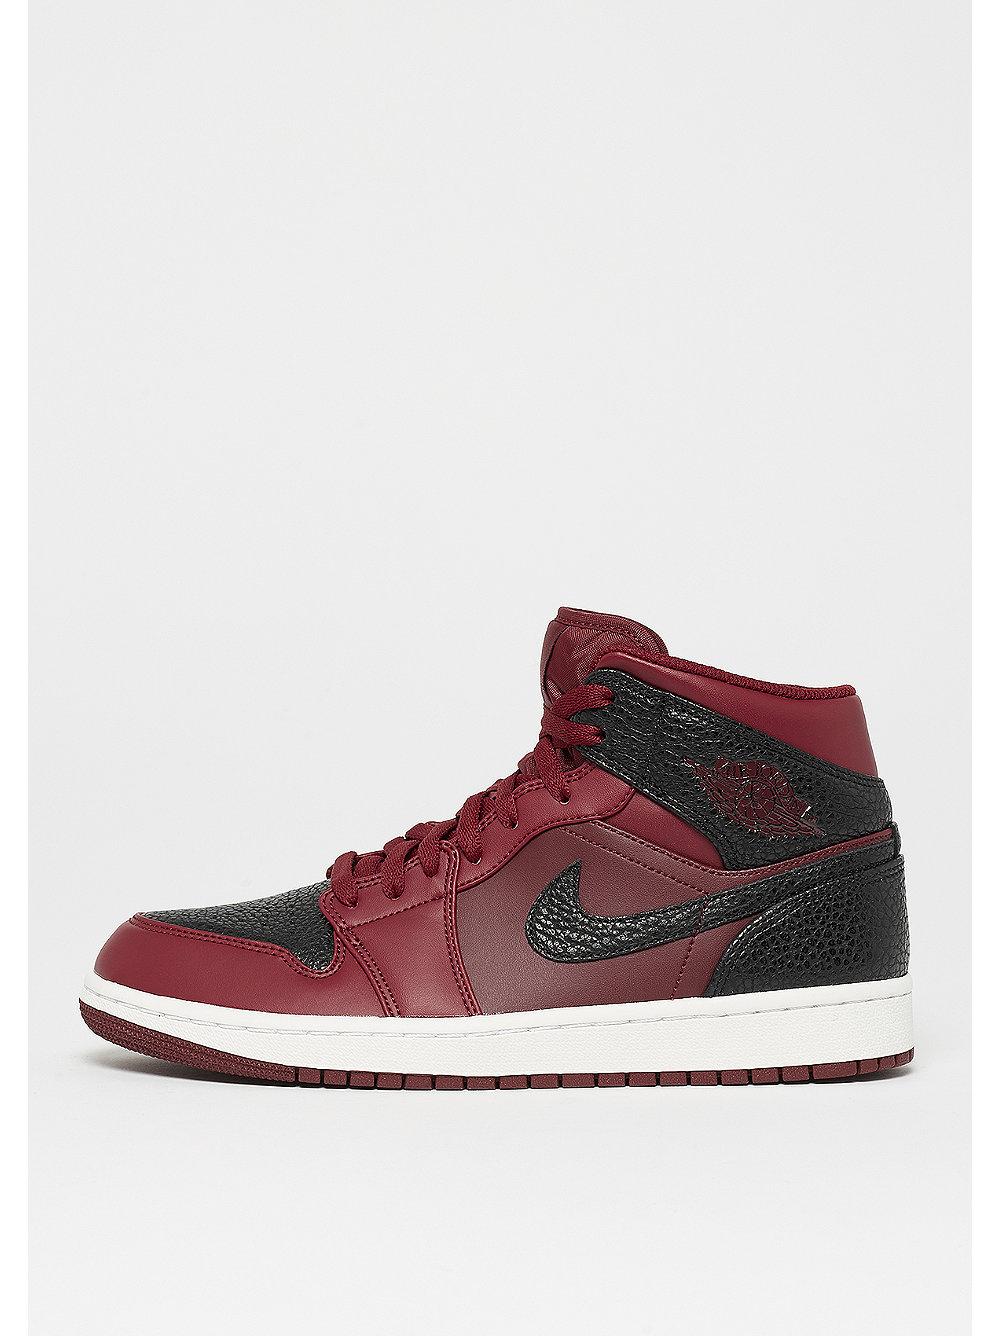 Jordan herensneaker zwart, rood en wit